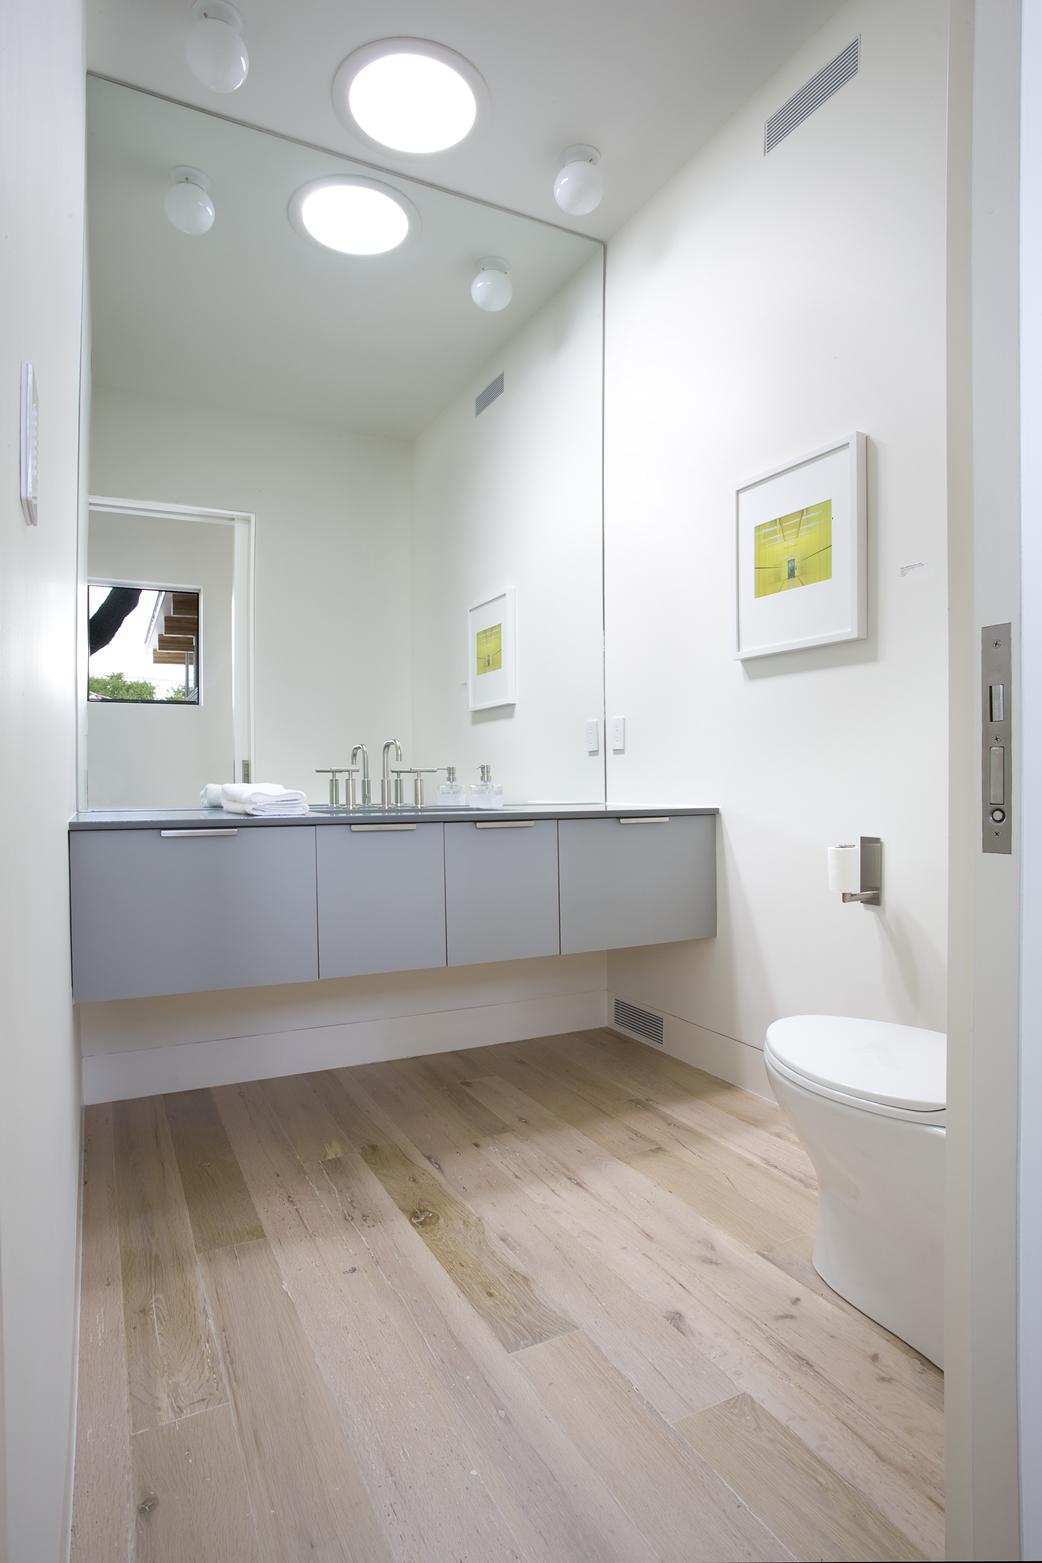 1000 images about Witte eiken vloeren on Pinterest. White Hardwood Floor